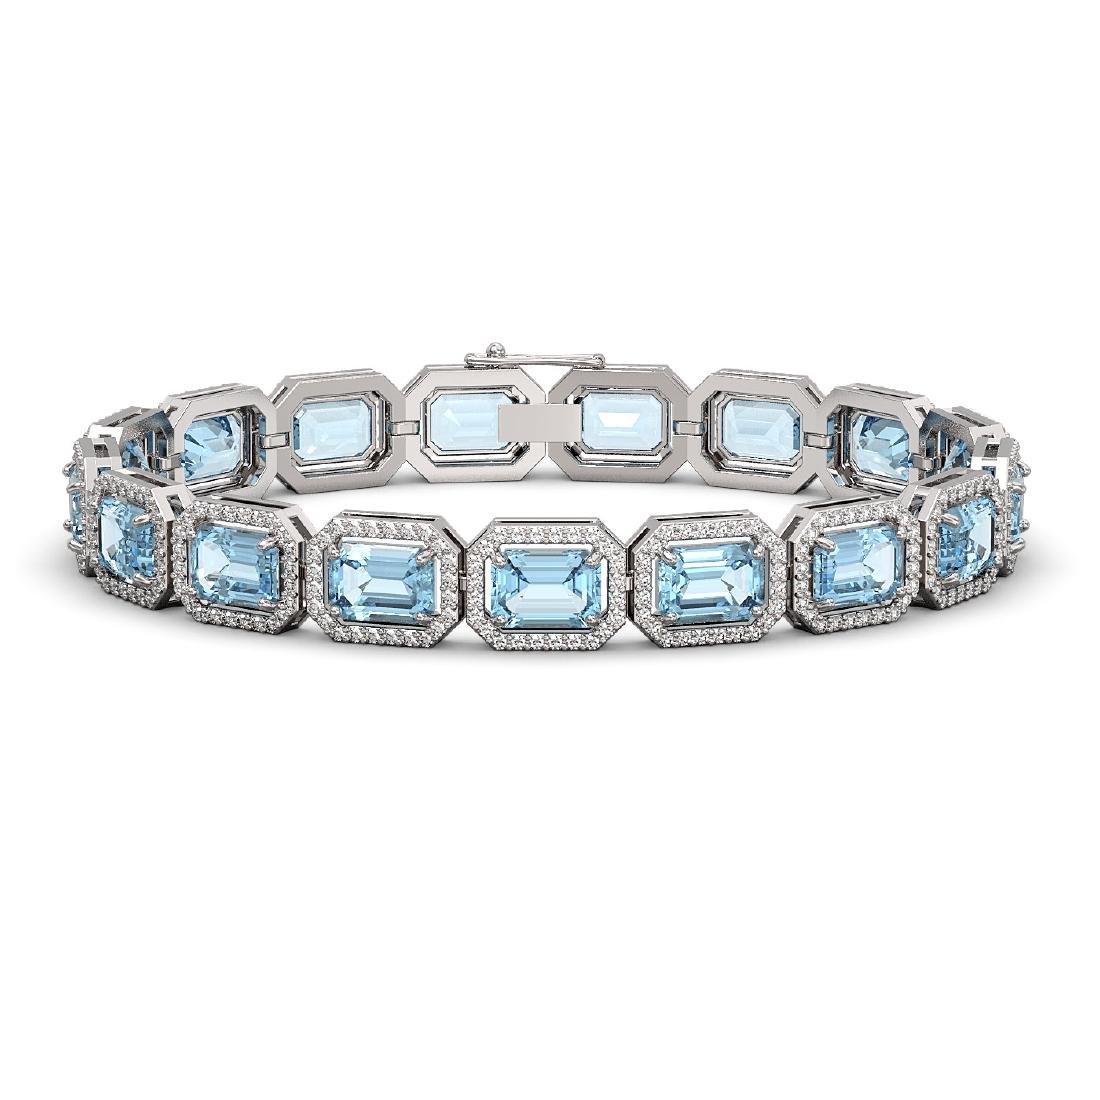 24.51 CTW Aquamarine & Diamond Halo Bracelet 10K White